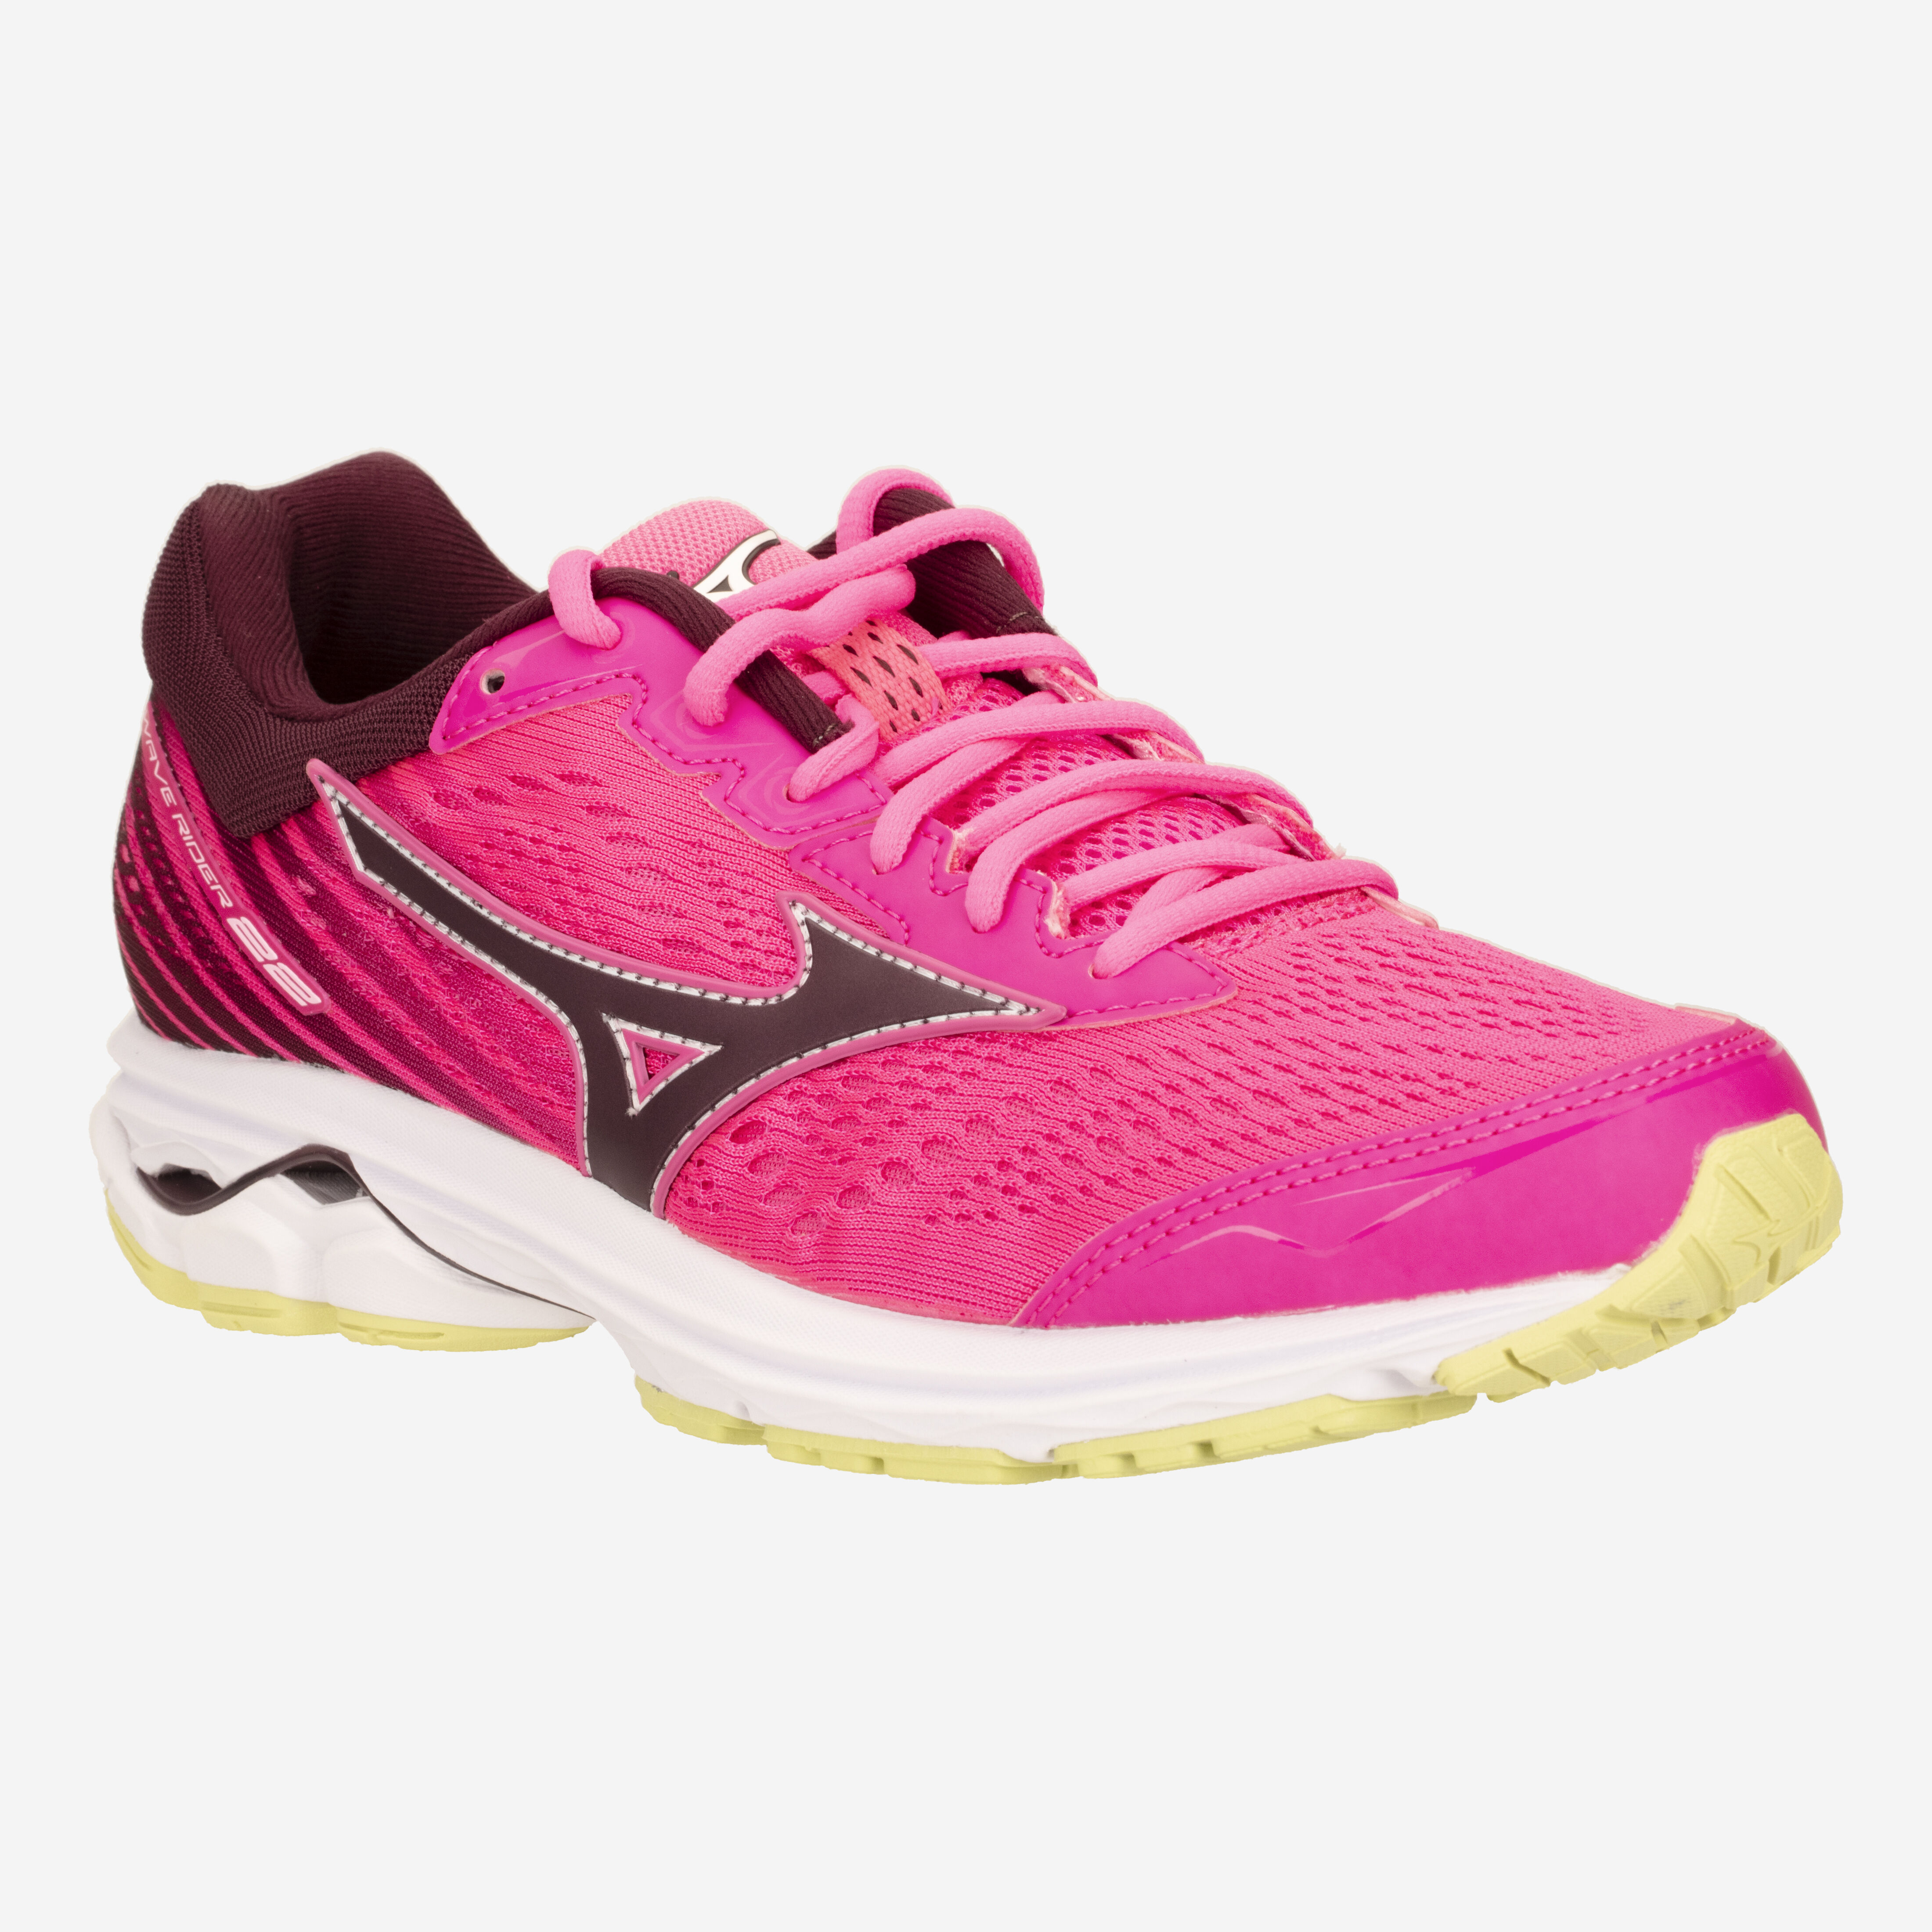 4942e5490 Mizuno Wave Rider 22 W shoes 2019 RUNKD online running store